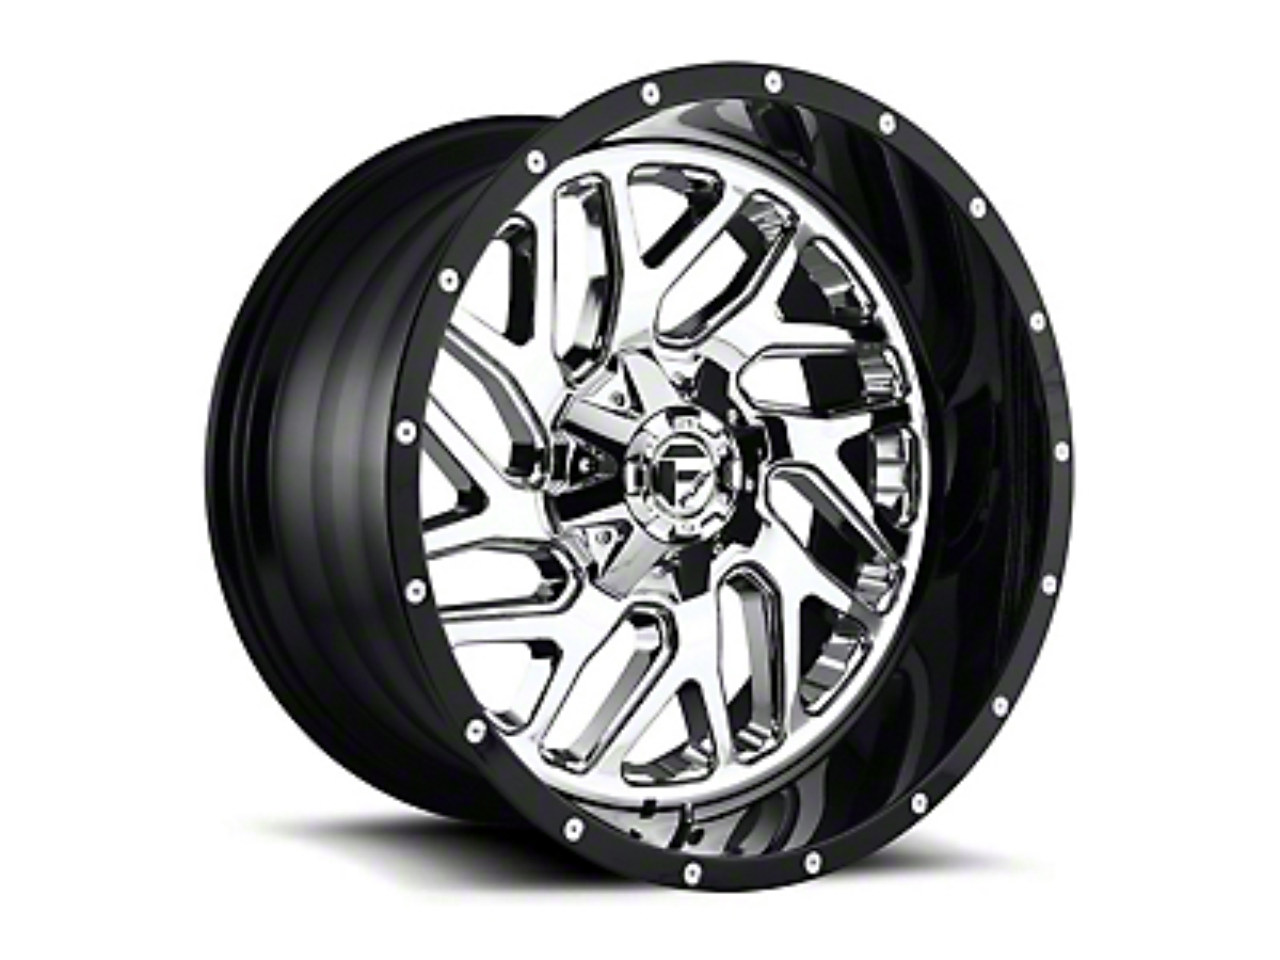 Fuel Wheels Triton Chrome 5-Lug Wheel - 20x10 (02-18 RAM 1500, Excluding Mega Cab)